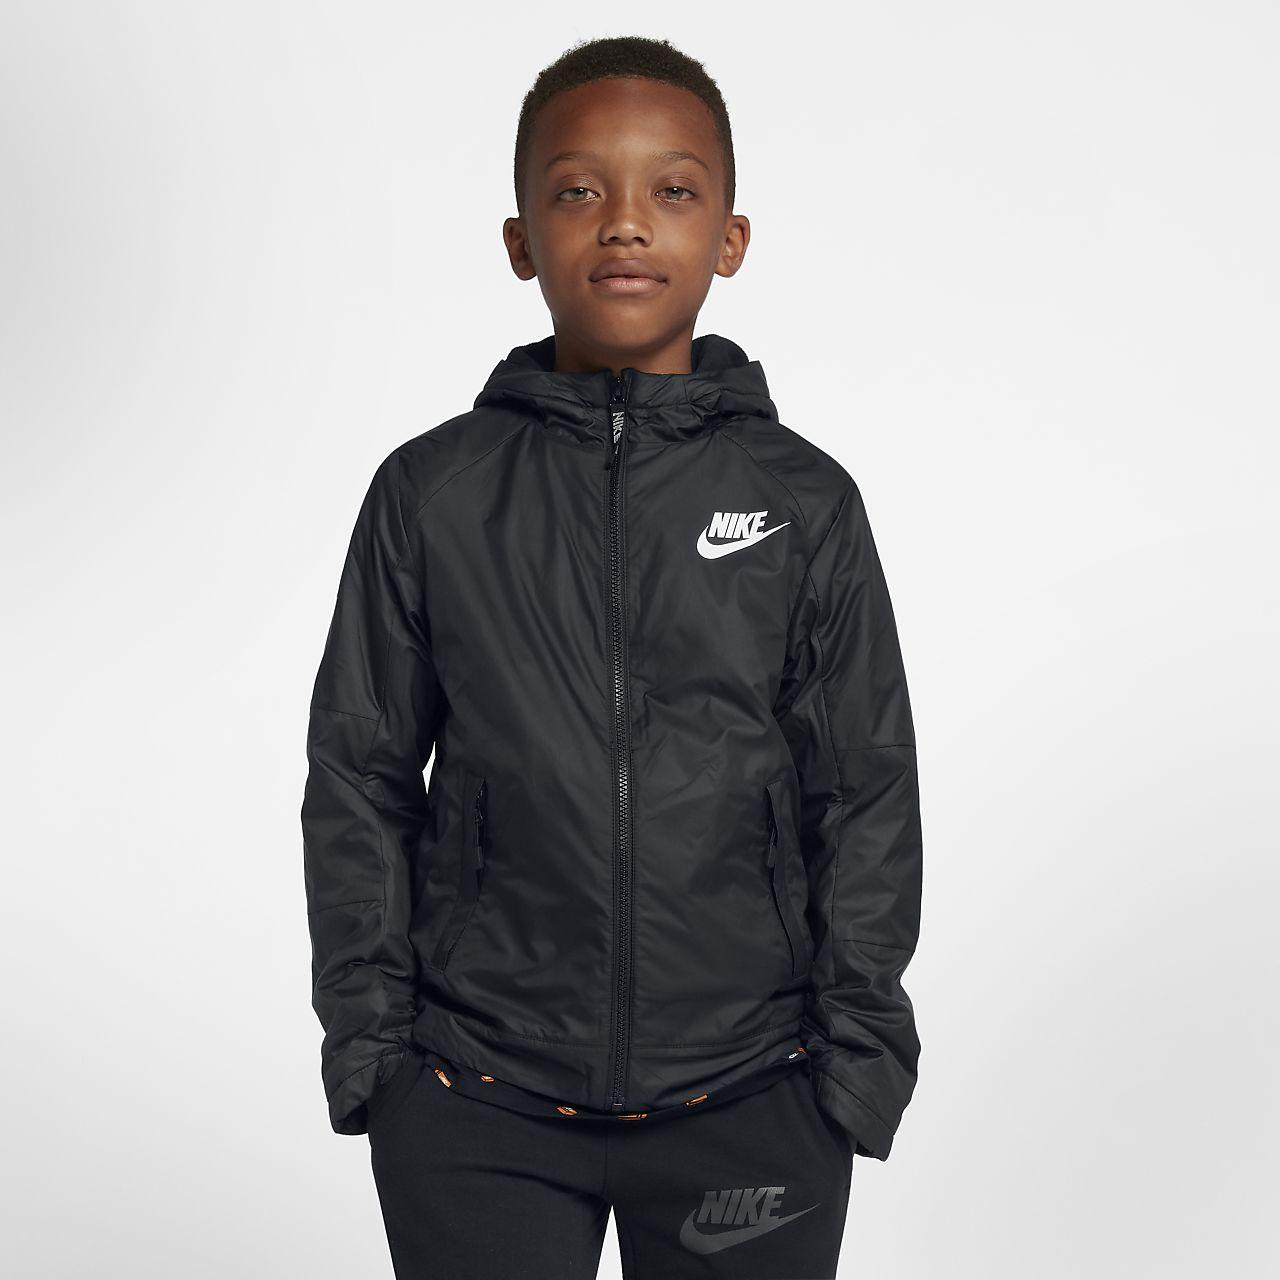 aa9dcff0c6 Giacca Nike Sportswear - Ragazzi